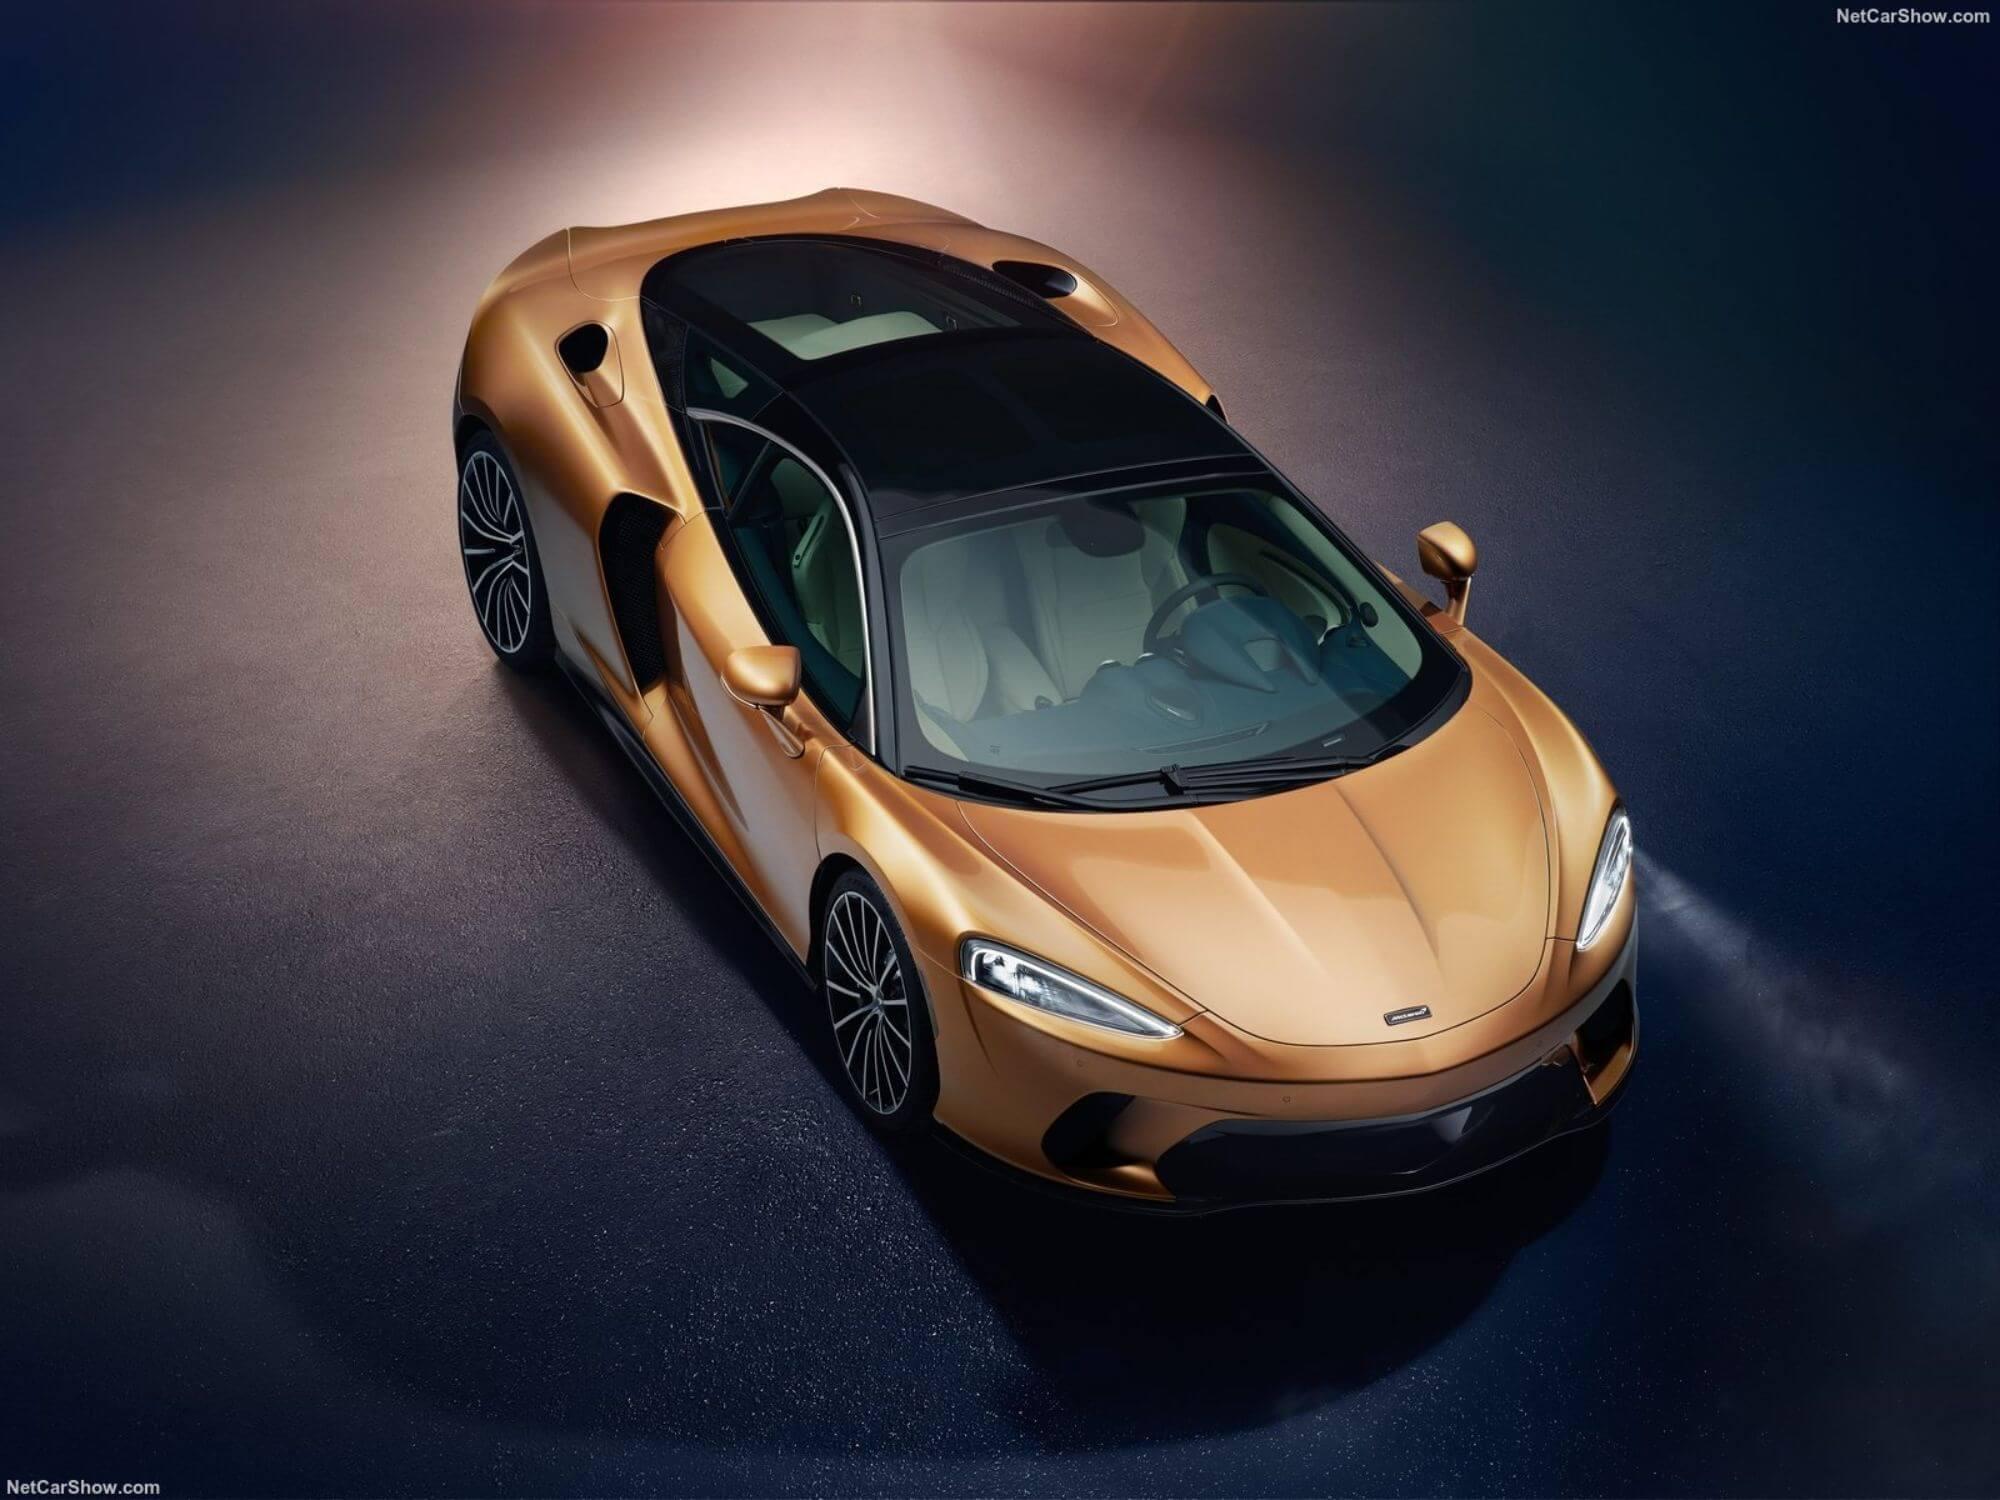 McLaren: Nu som behagelig langtursbil